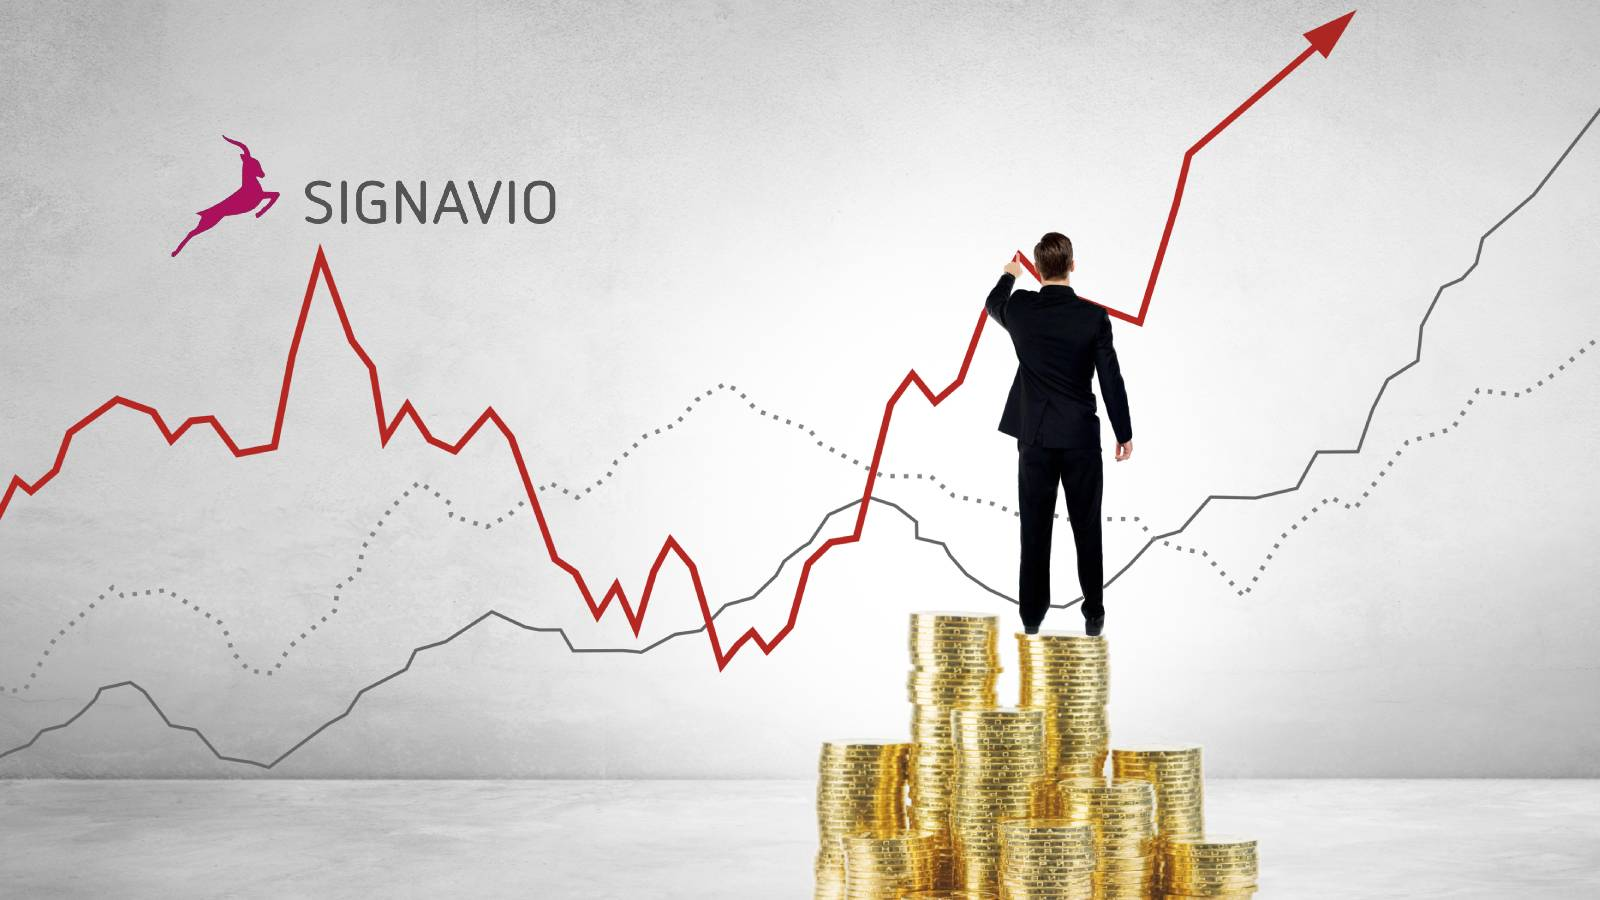 SAP in Talks to Buy Signavio?